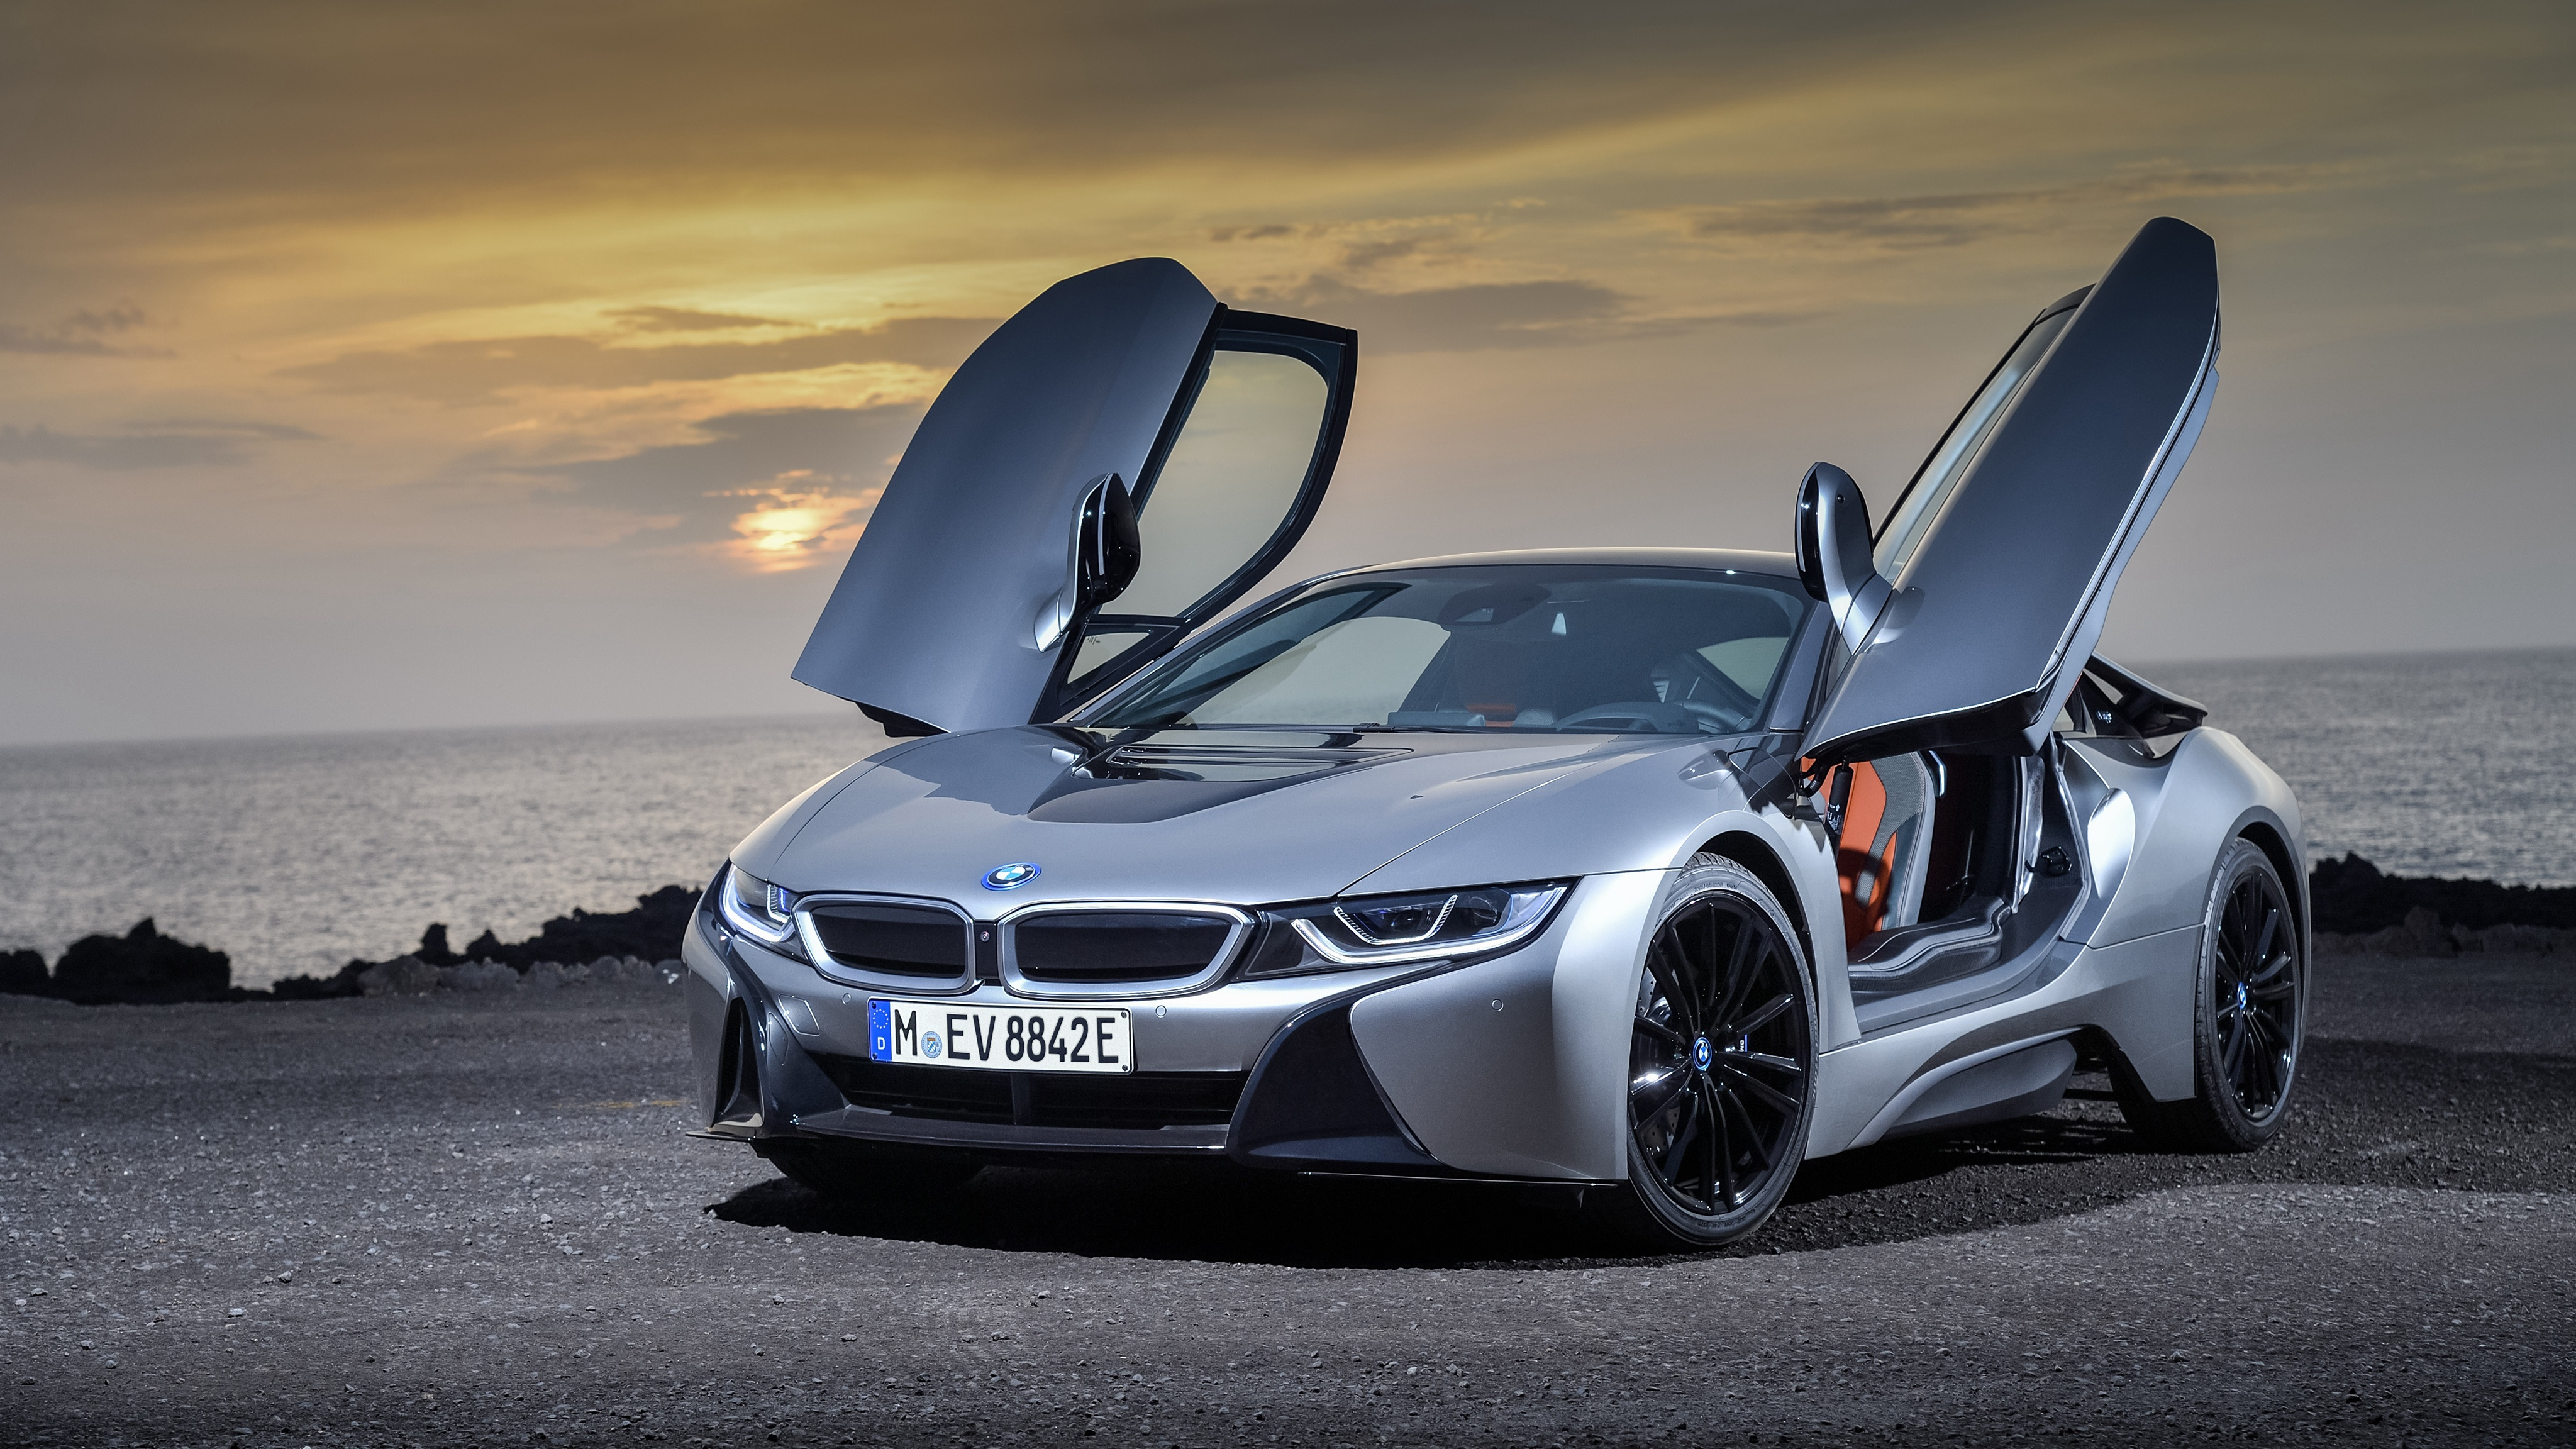 Bmw I8 Car Concept 4k Hd Desktop Wallpaper For 4k Ultra Hd: BMW I8 4k Ultra HD Wallpaper